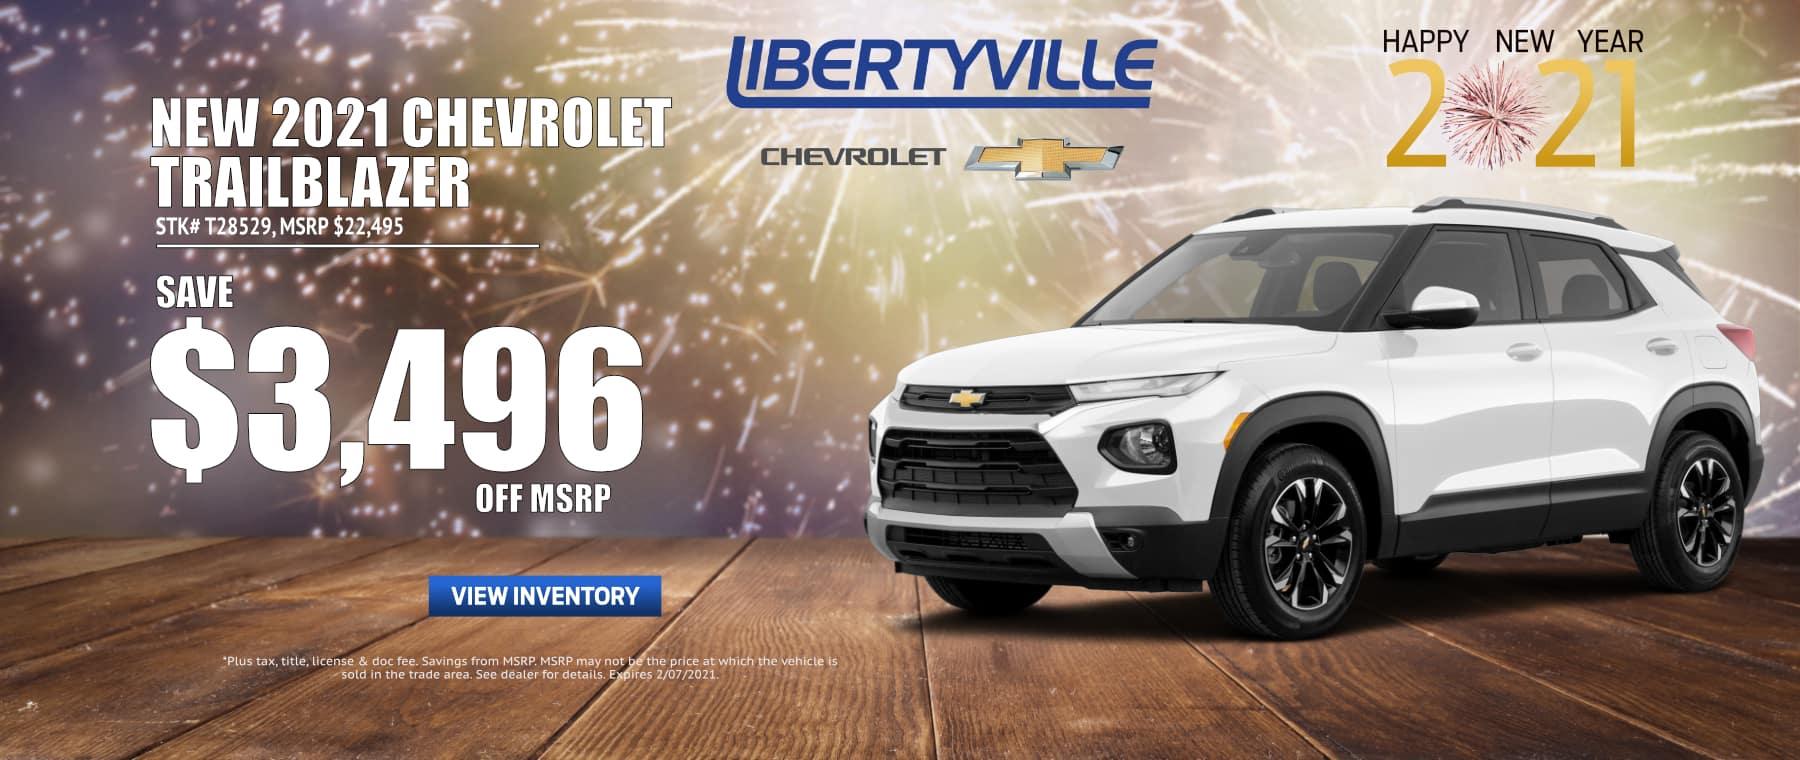 January-2021_Trailblazer_Sale__Libertyville